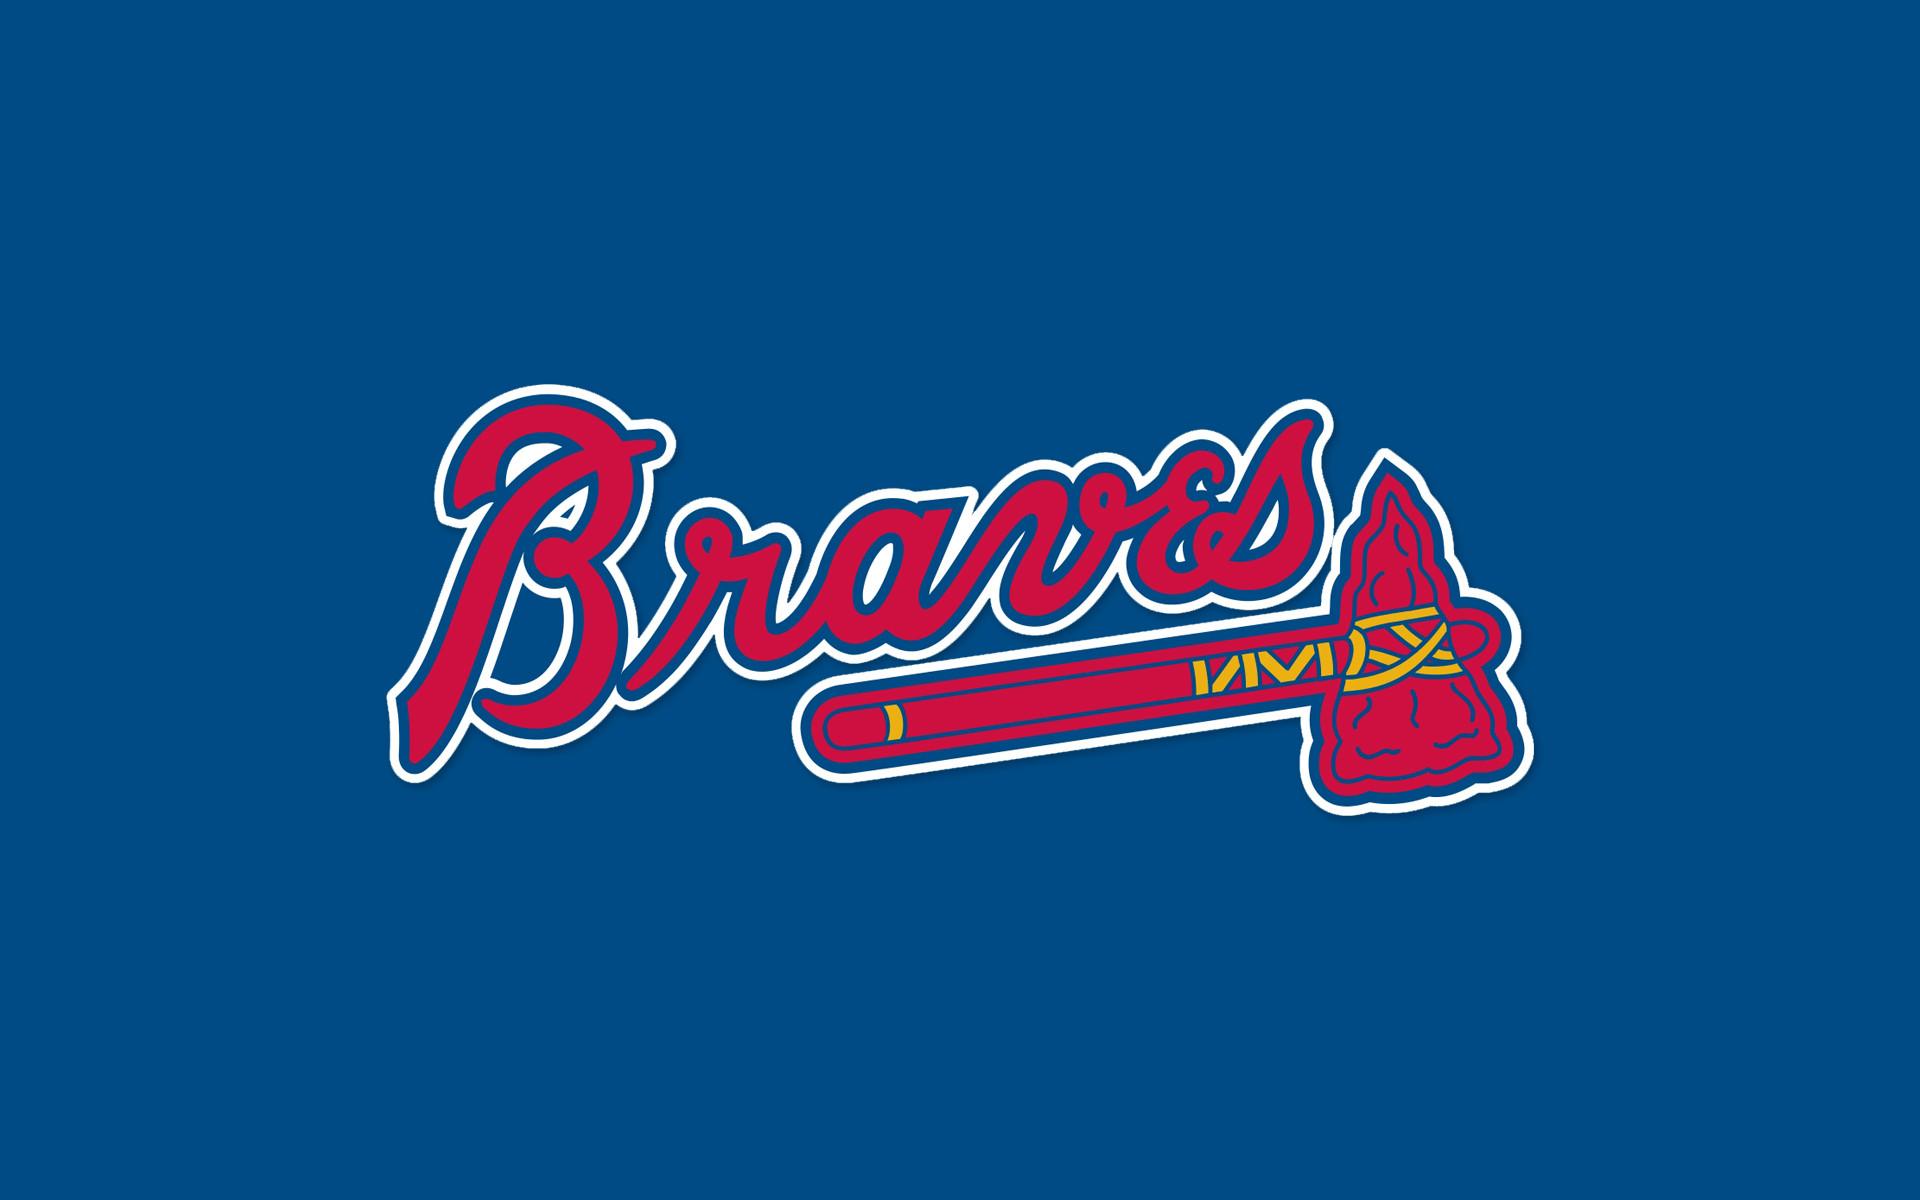 Atlanta Braves Wallpapers 62 Images: Major League Baseball Wallpaper (67+ Images